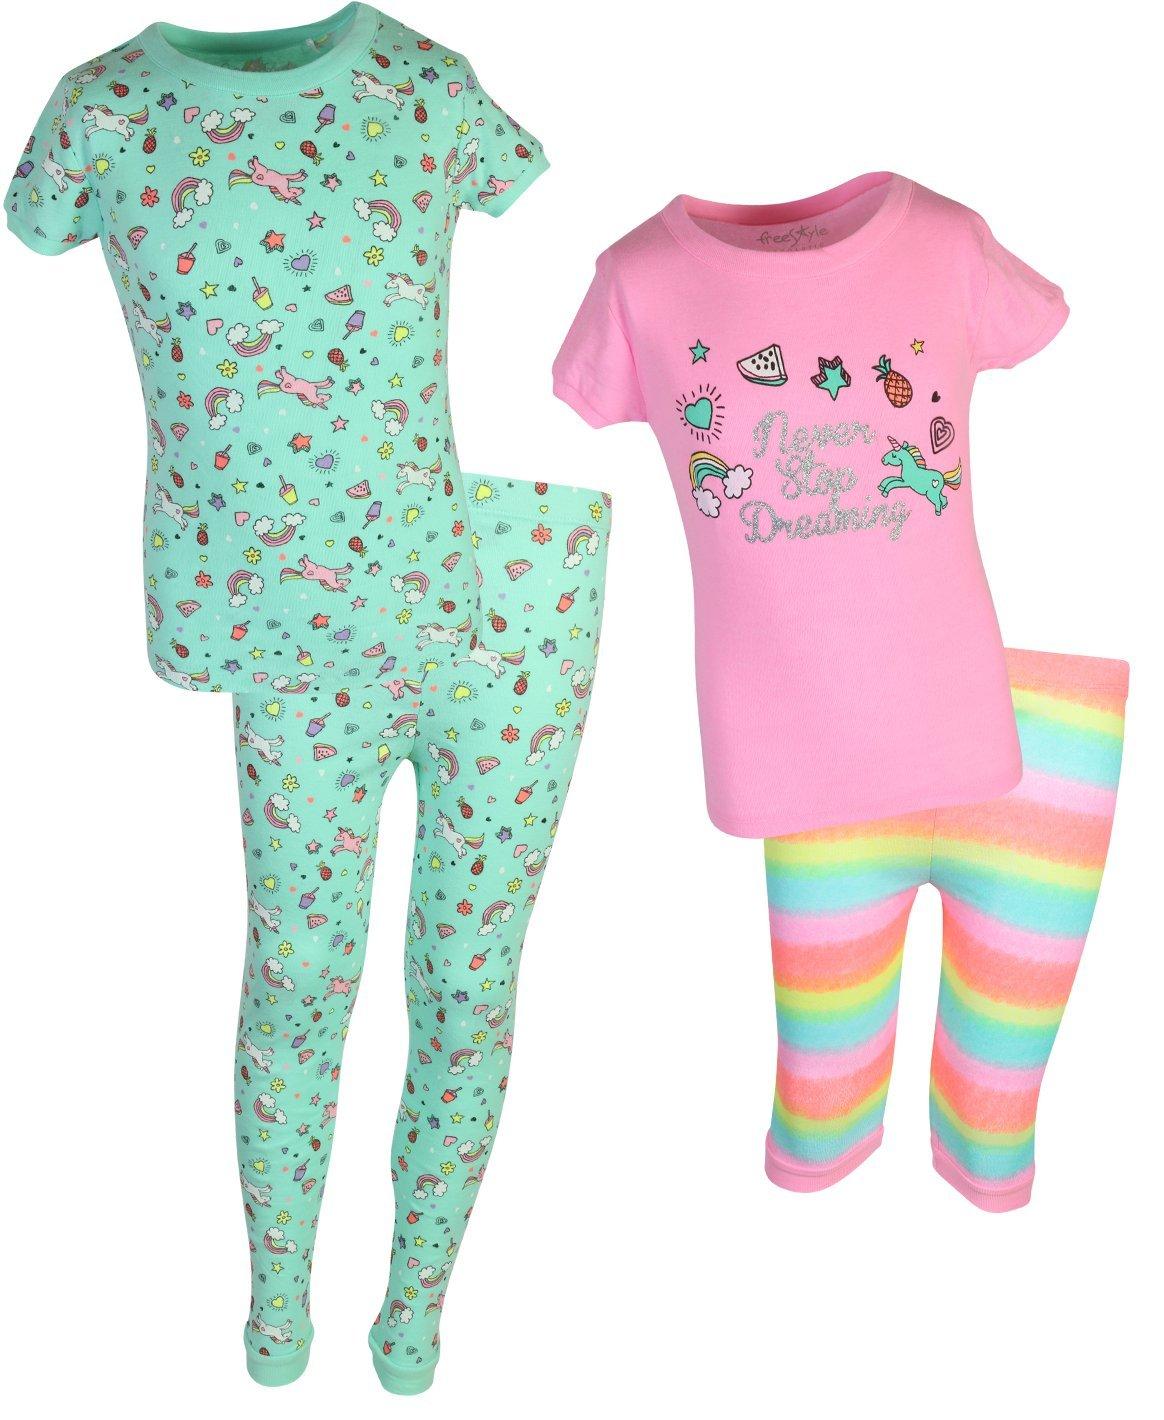 Freestyle Girl's 4-Piece Snug Fit Spring Pajama Set(2 Full Sets) Unicorn, Size 10'